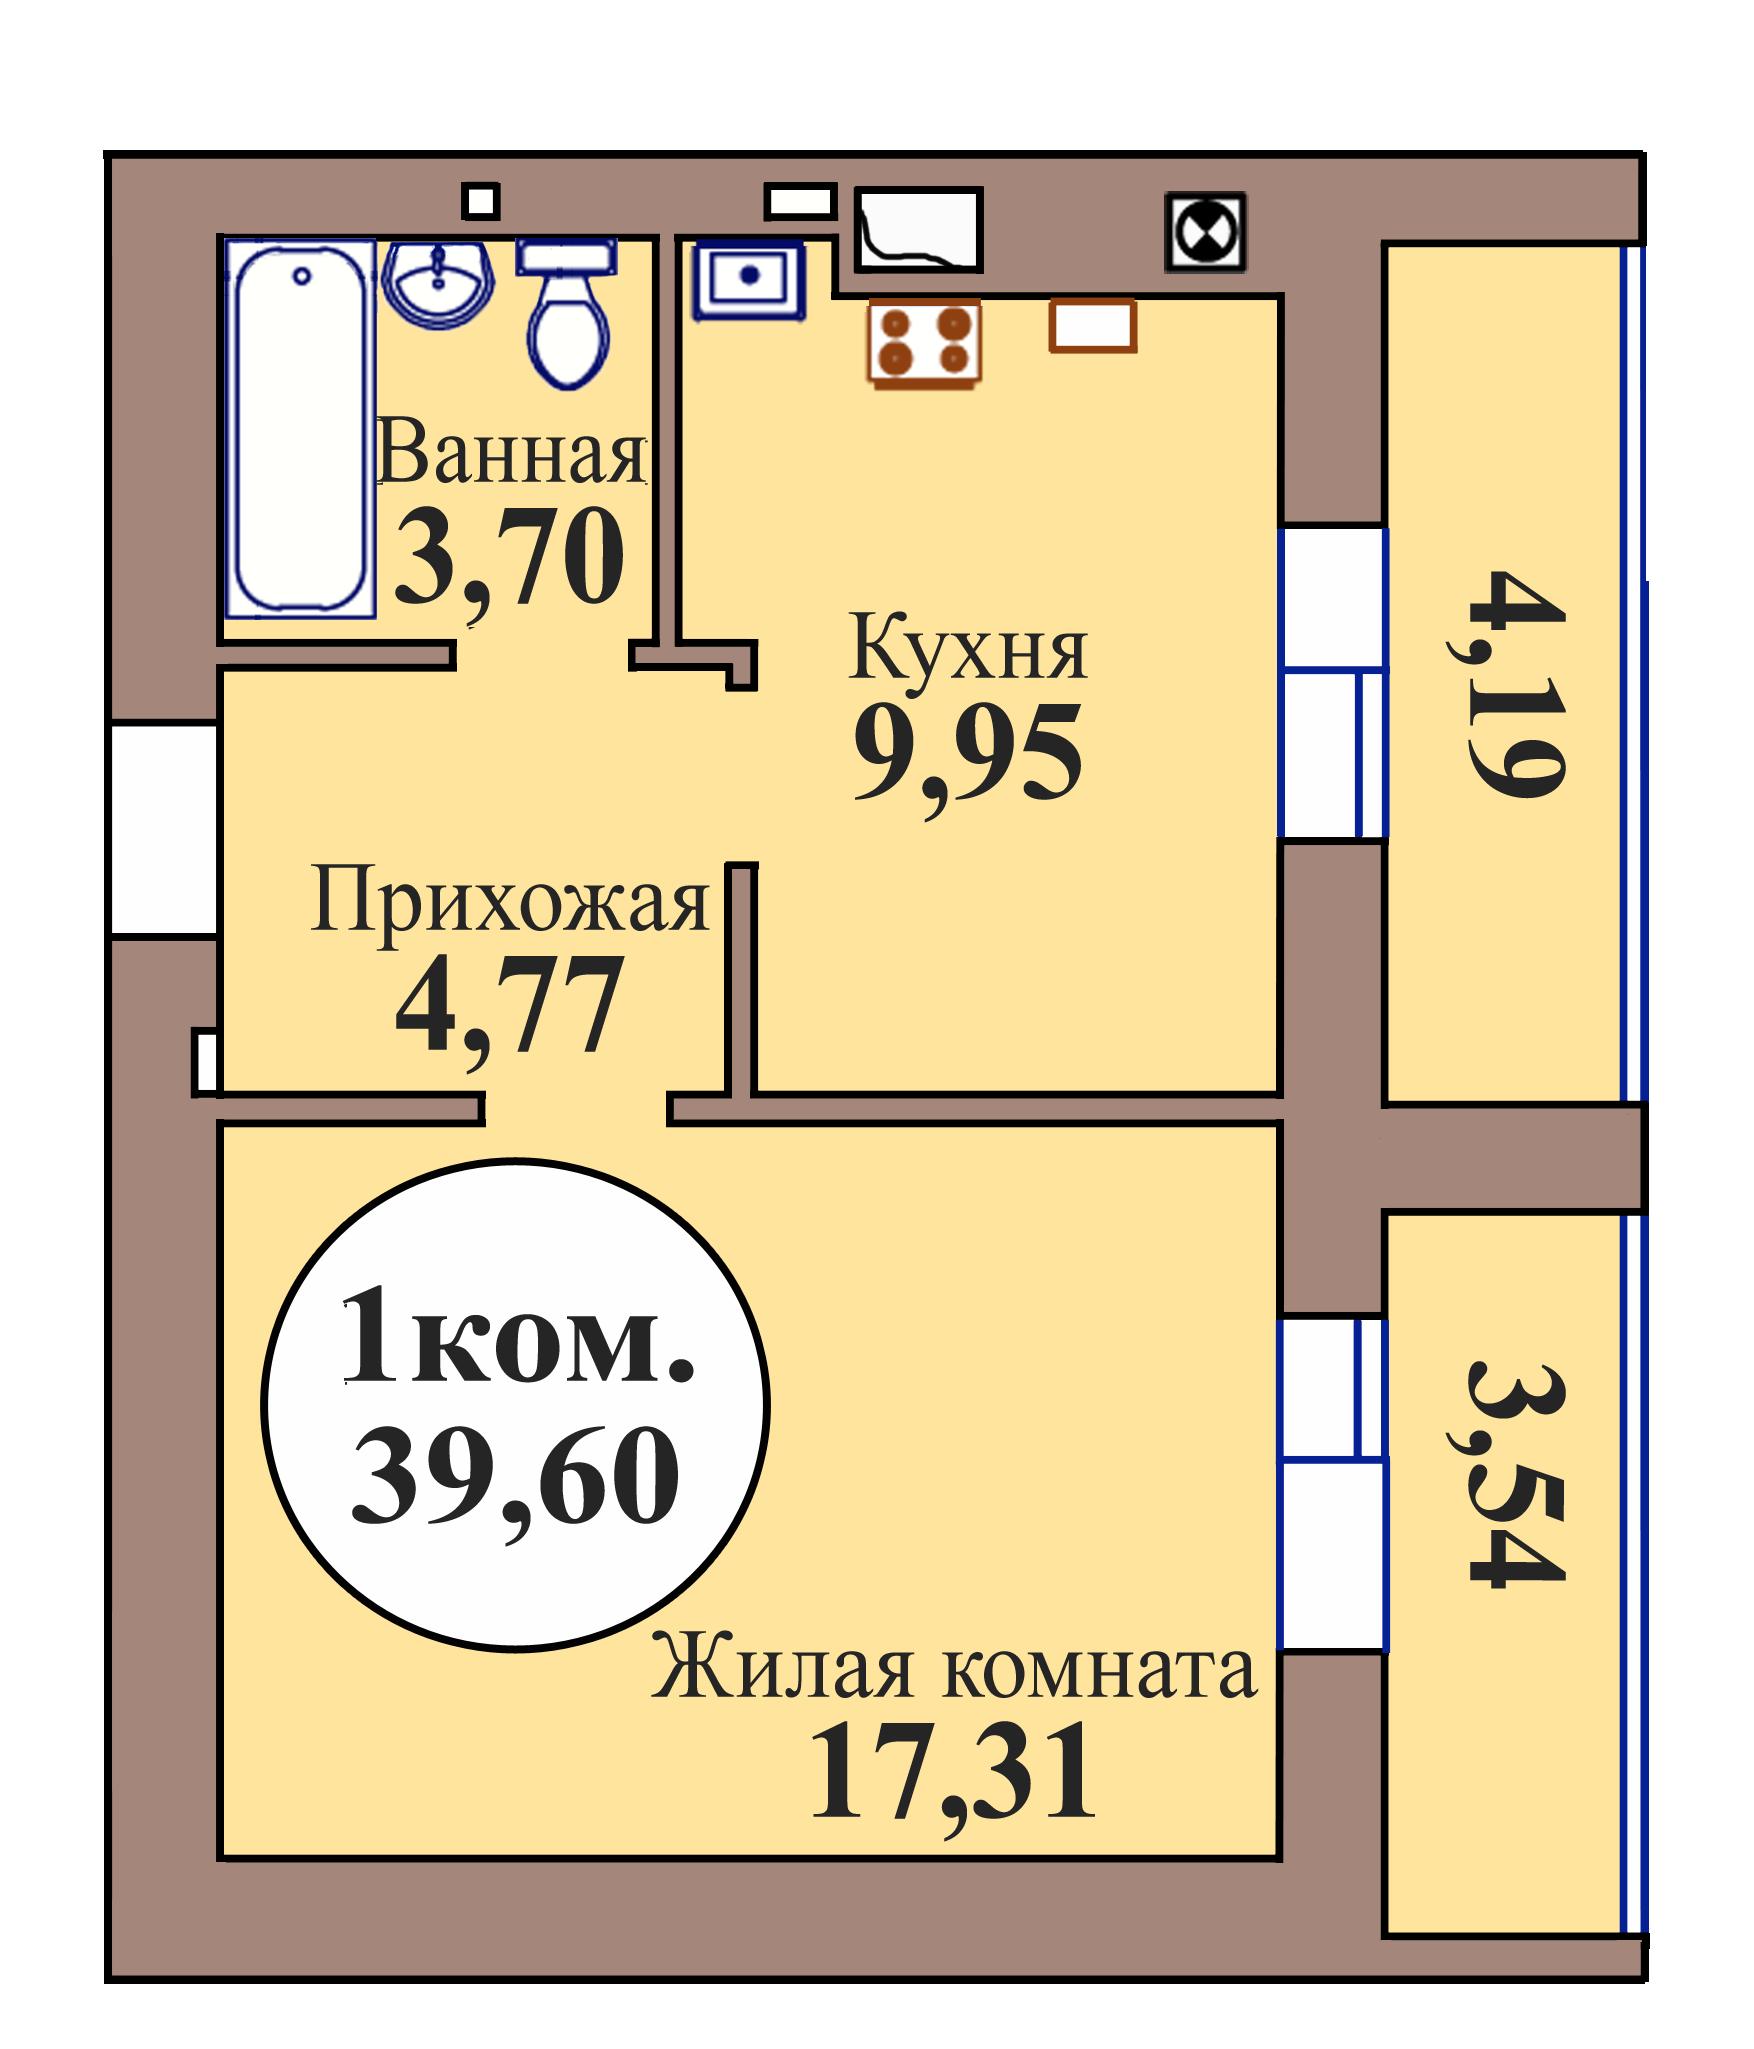 1-комн. кв. по пер. Калининградский, 5 кв. 65 в Калининграде